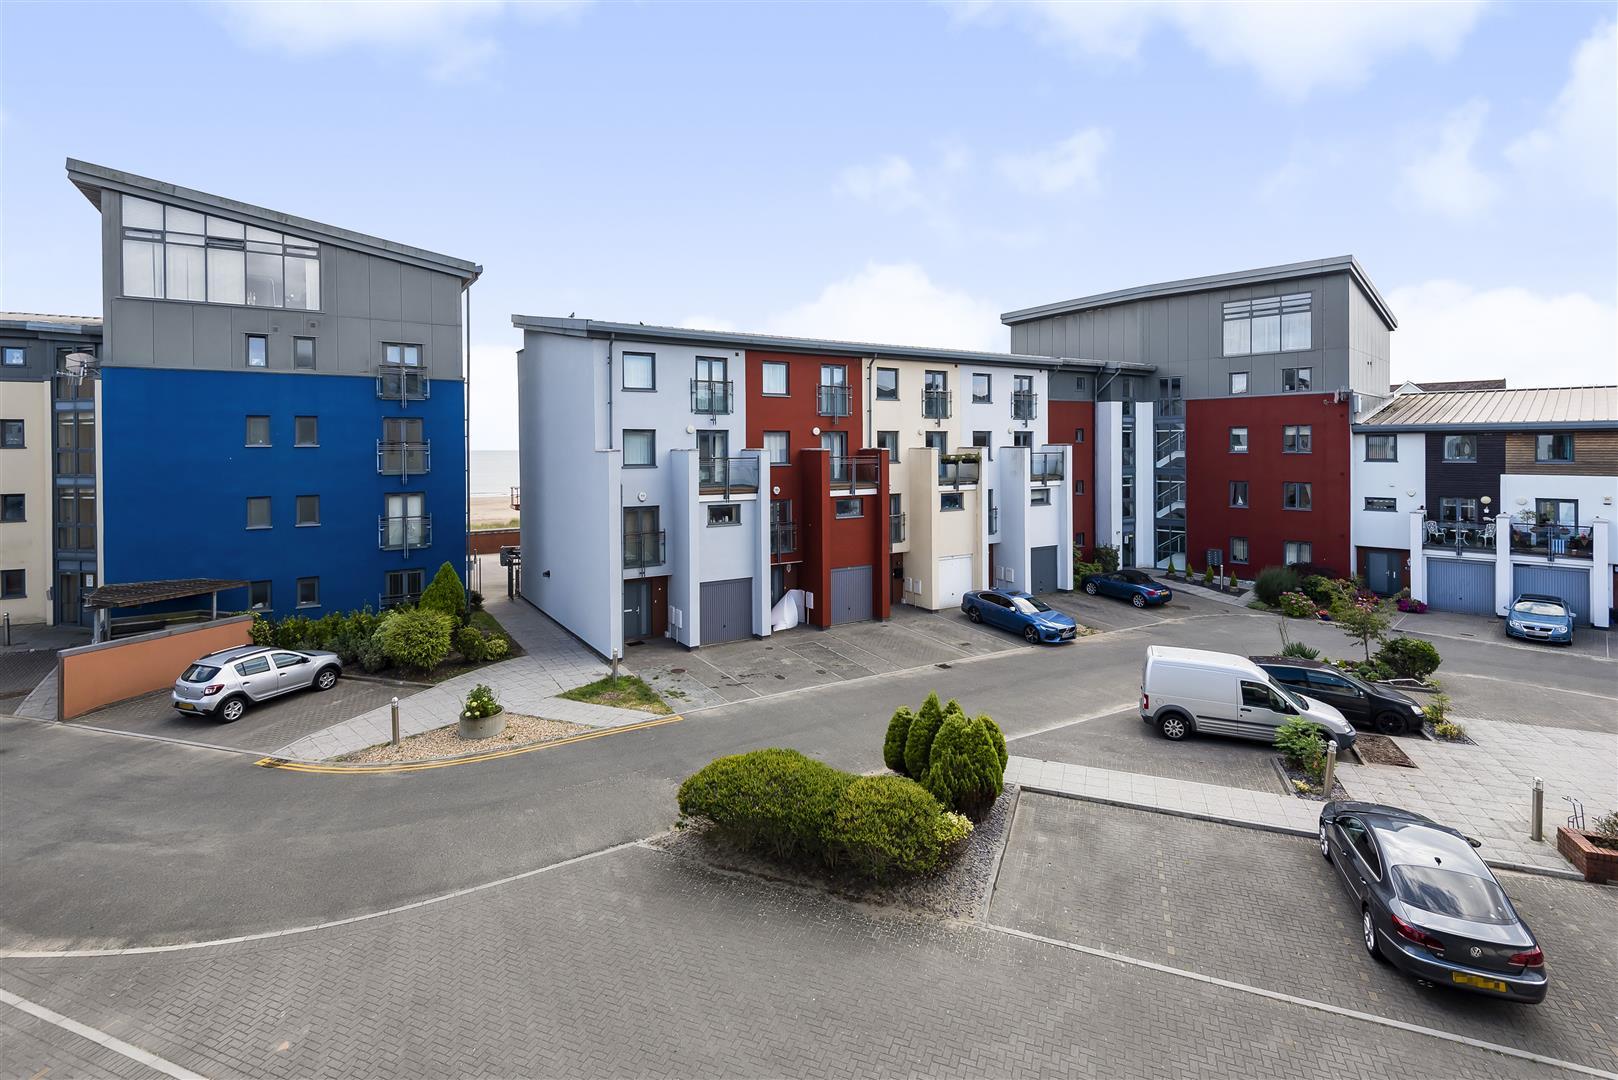 St. Christophers Court, Marina, Swansea, SA1 1UD